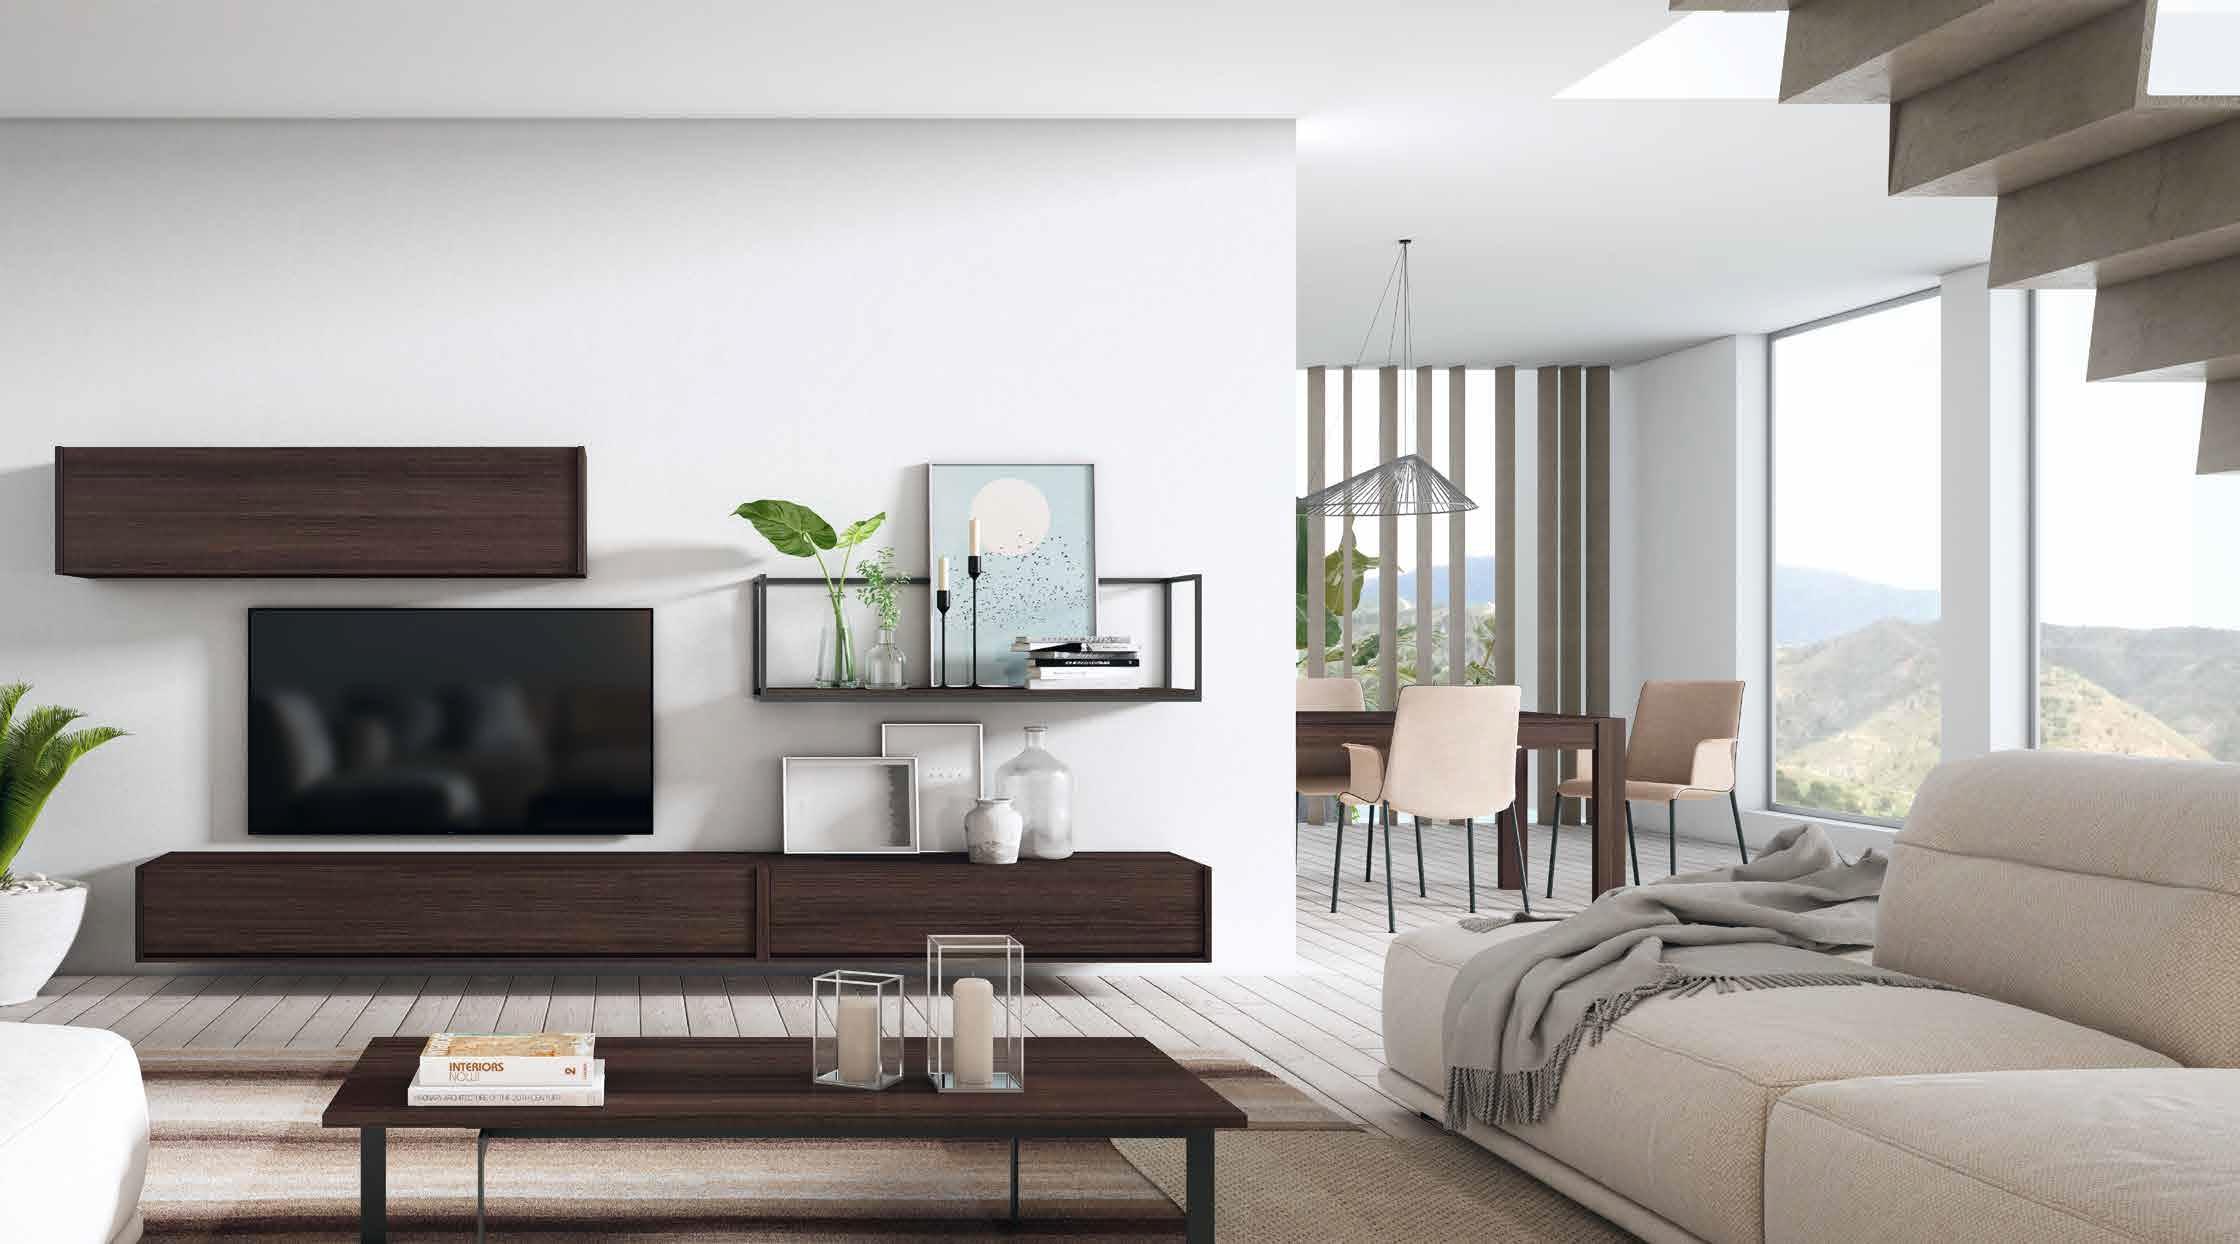 salon-moderno-Nativ-2019-muebles-paco-caballero-0920-5c8ceaa89b88c